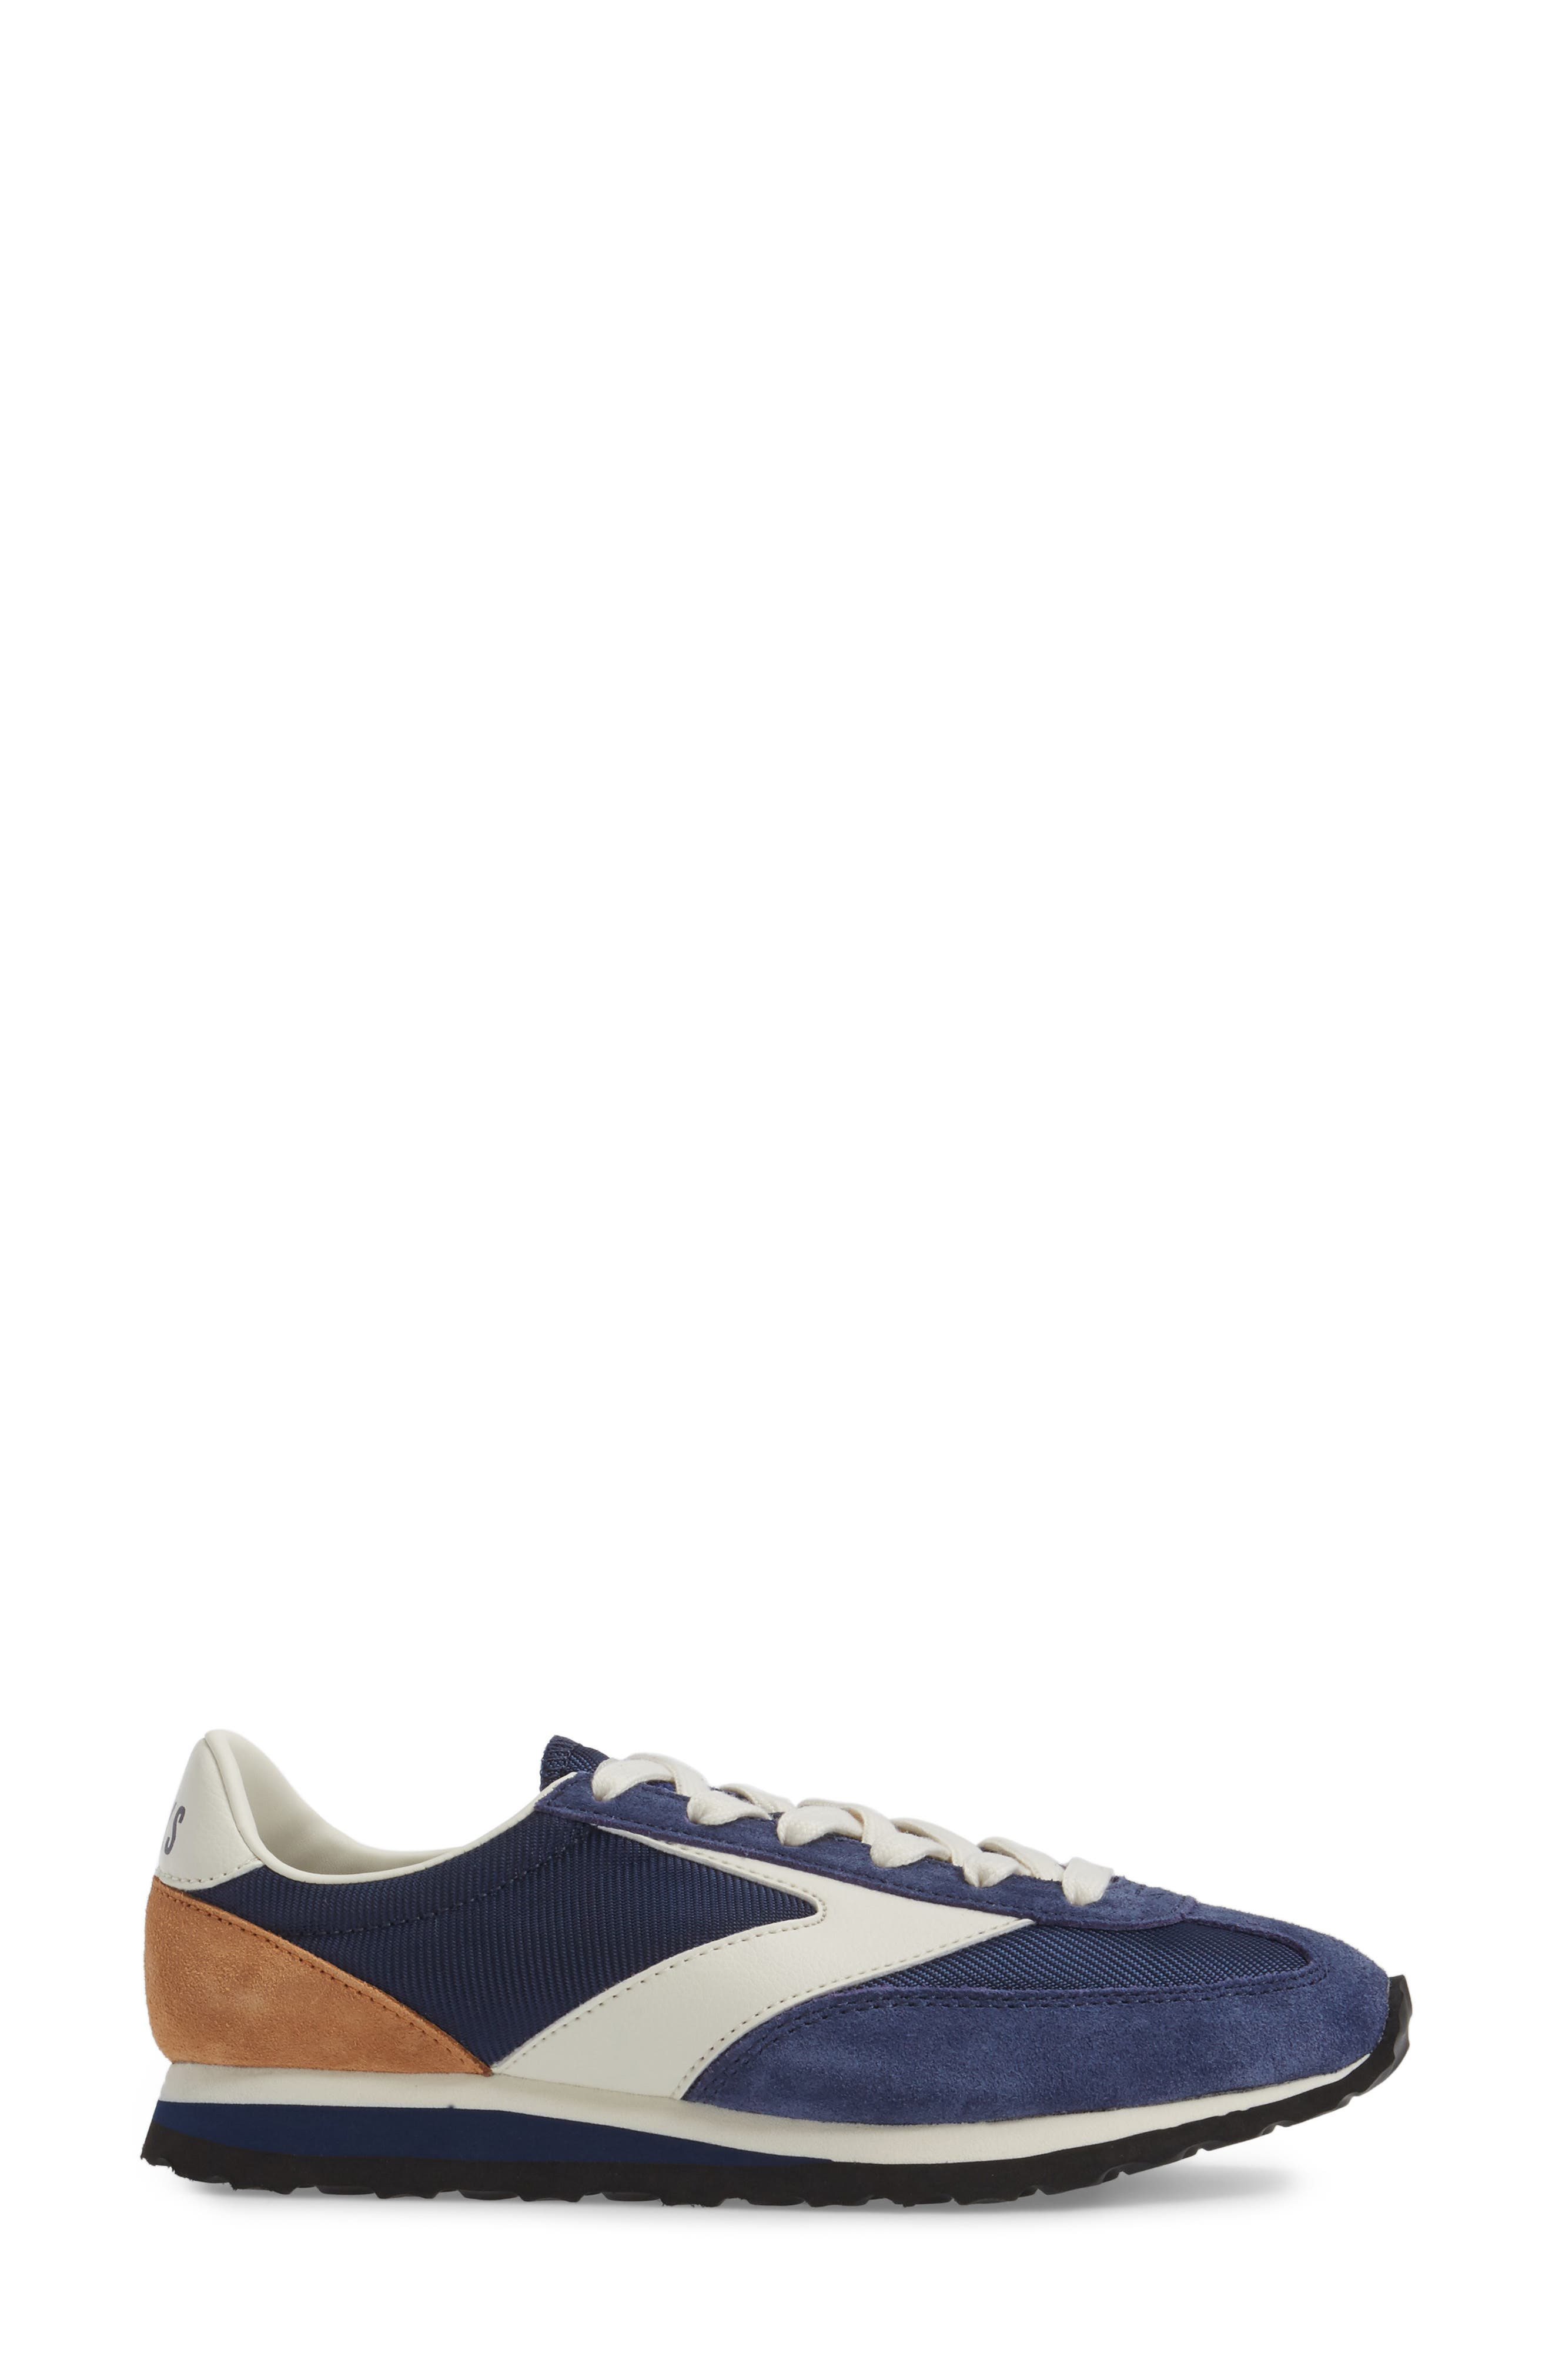 'Vanguard' Sneaker,                             Alternate thumbnail 105, color,